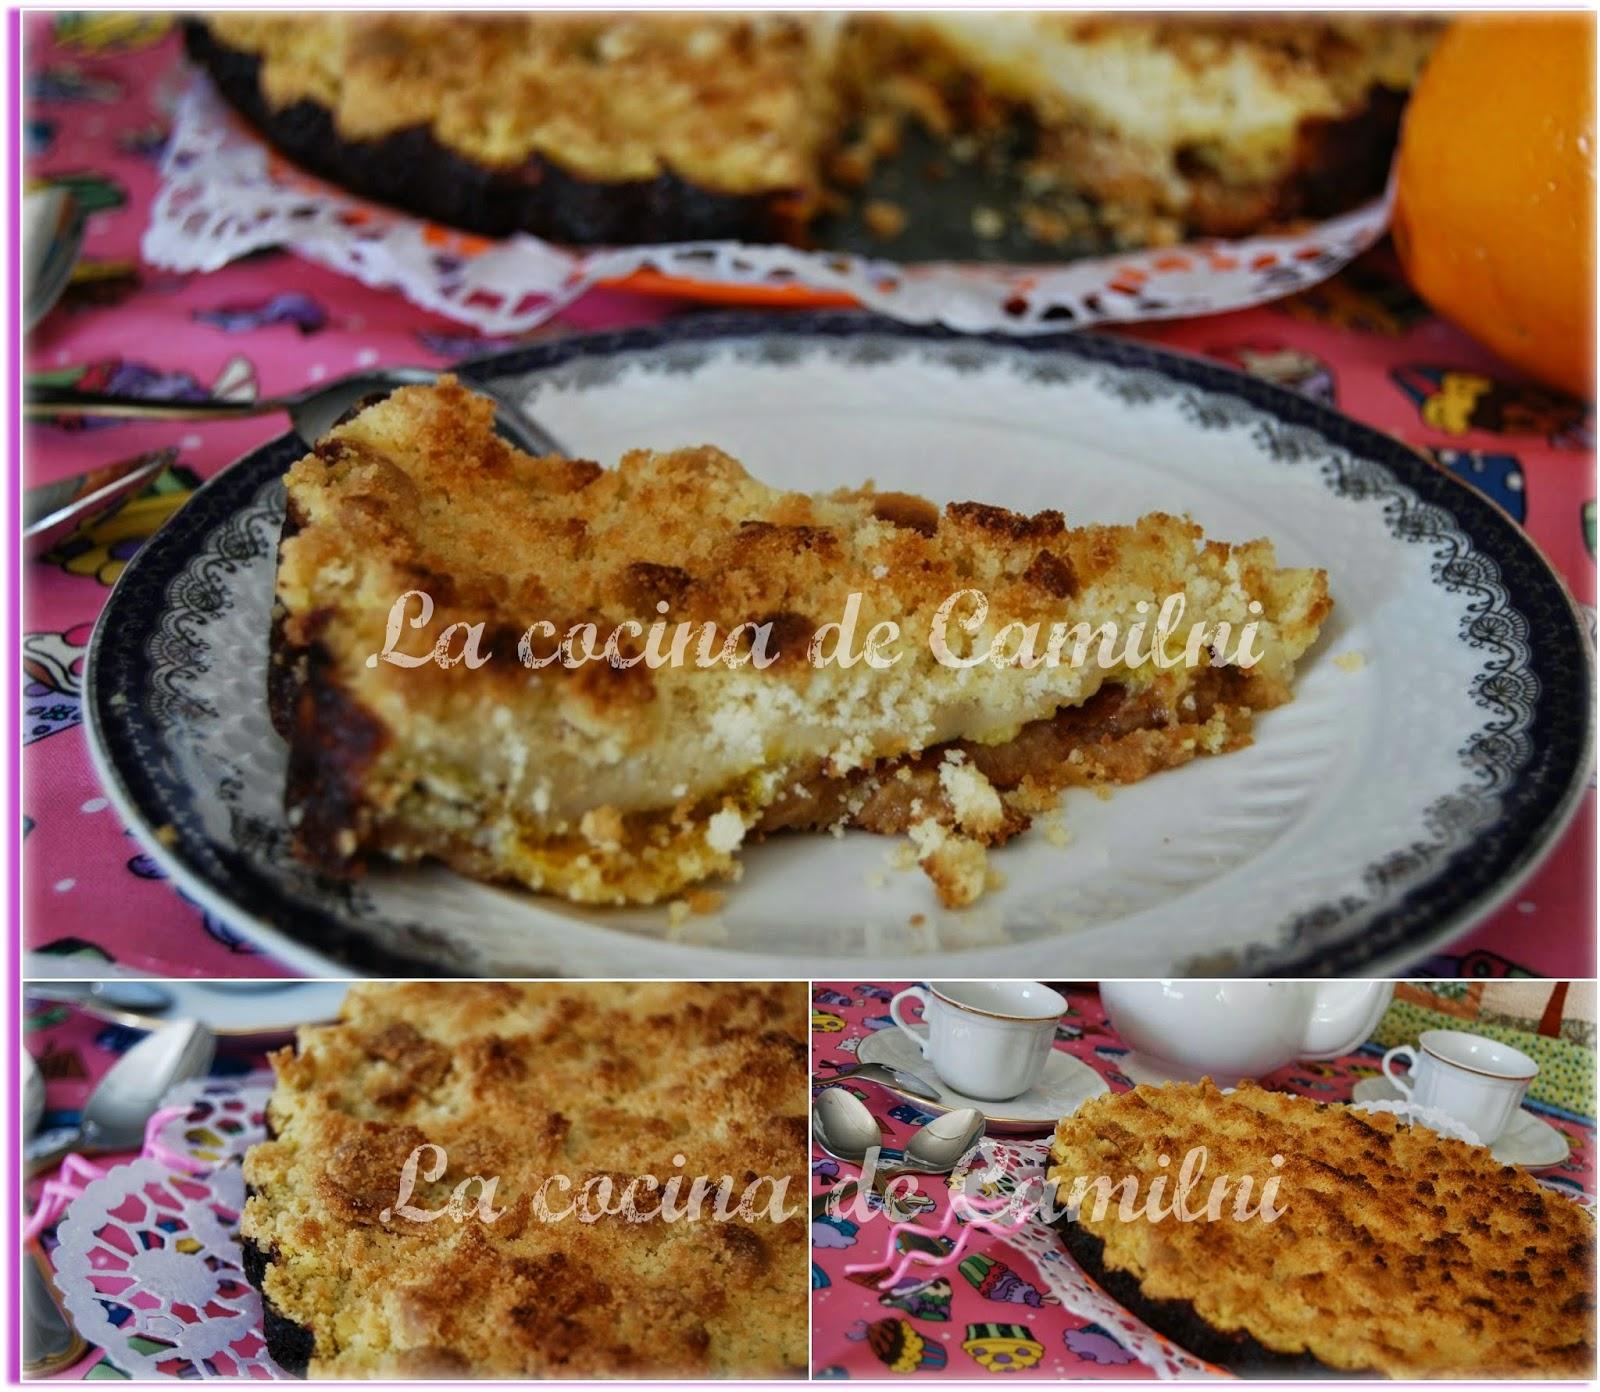 Streuselkuchen de naranja (La cocina de Camilni)